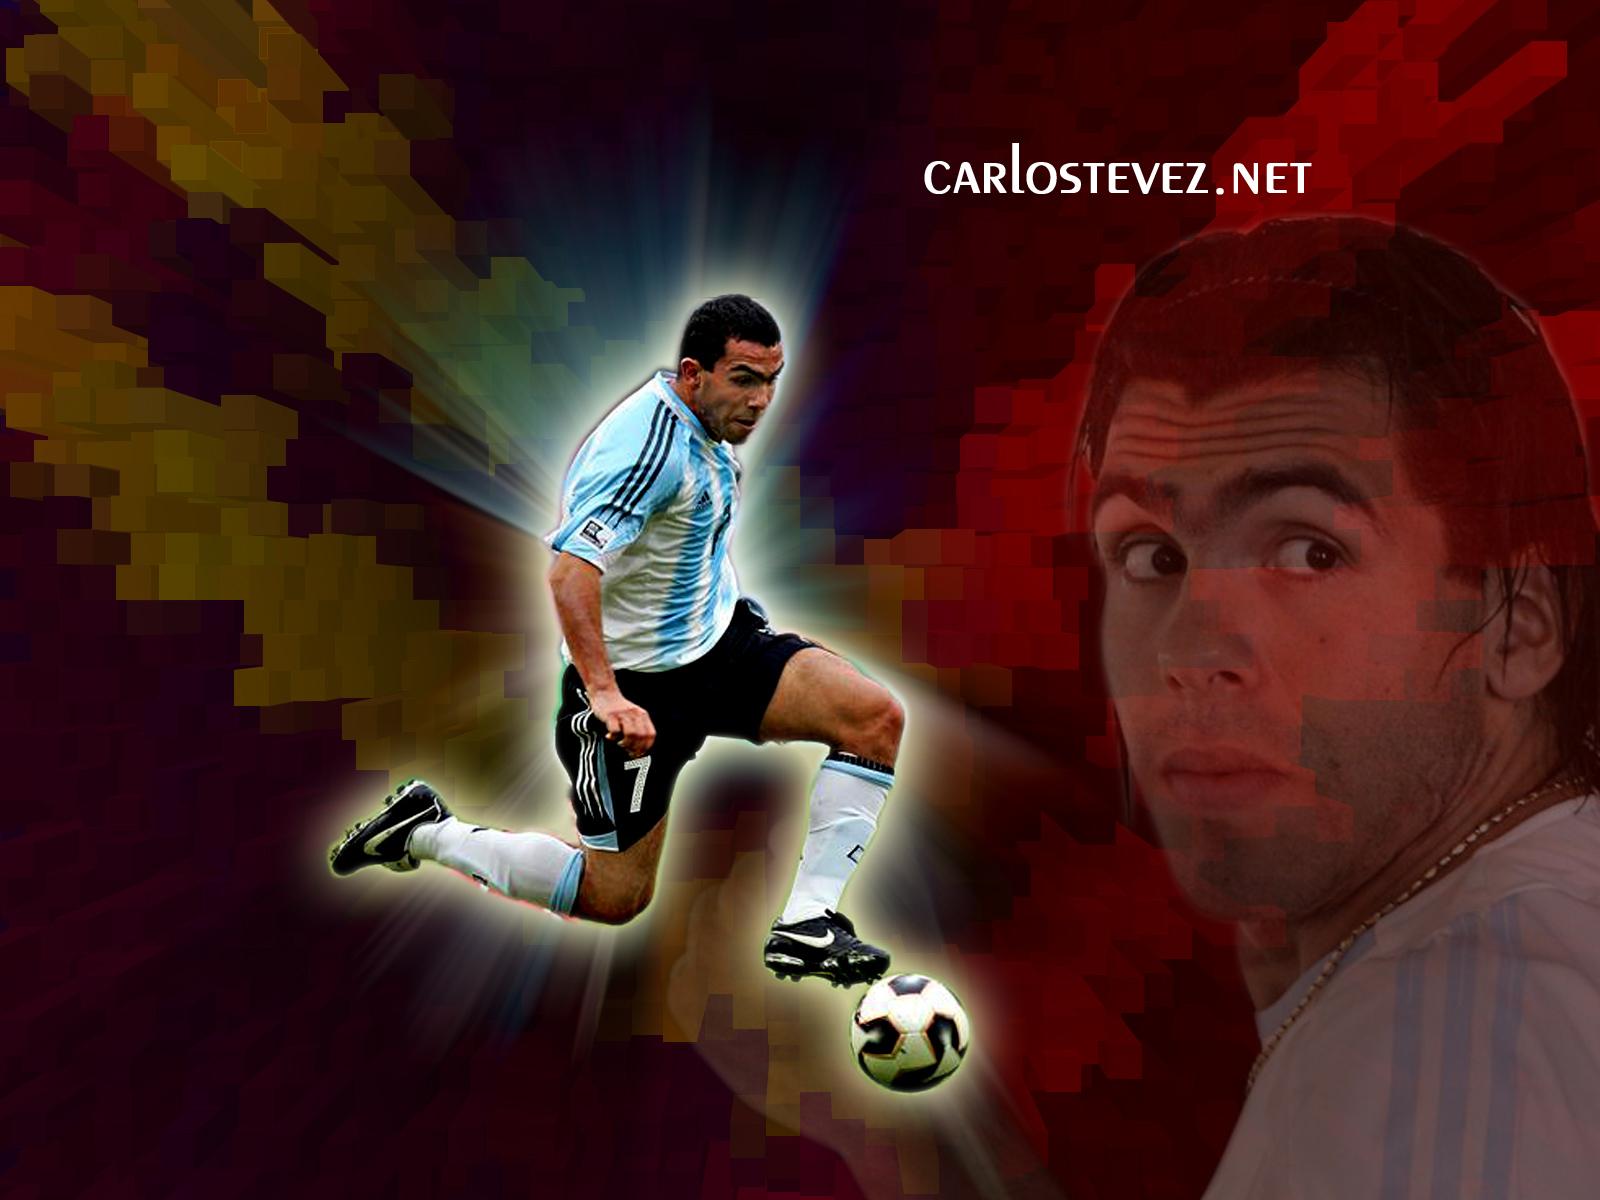 http://4.bp.blogspot.com/-MXK5VVRh4g8/Te92VeE8dEI/AAAAAAAACCQ/Jlf7YphtAxA/s1600/Carlos-Tevez-Wallpaper-5.jpg